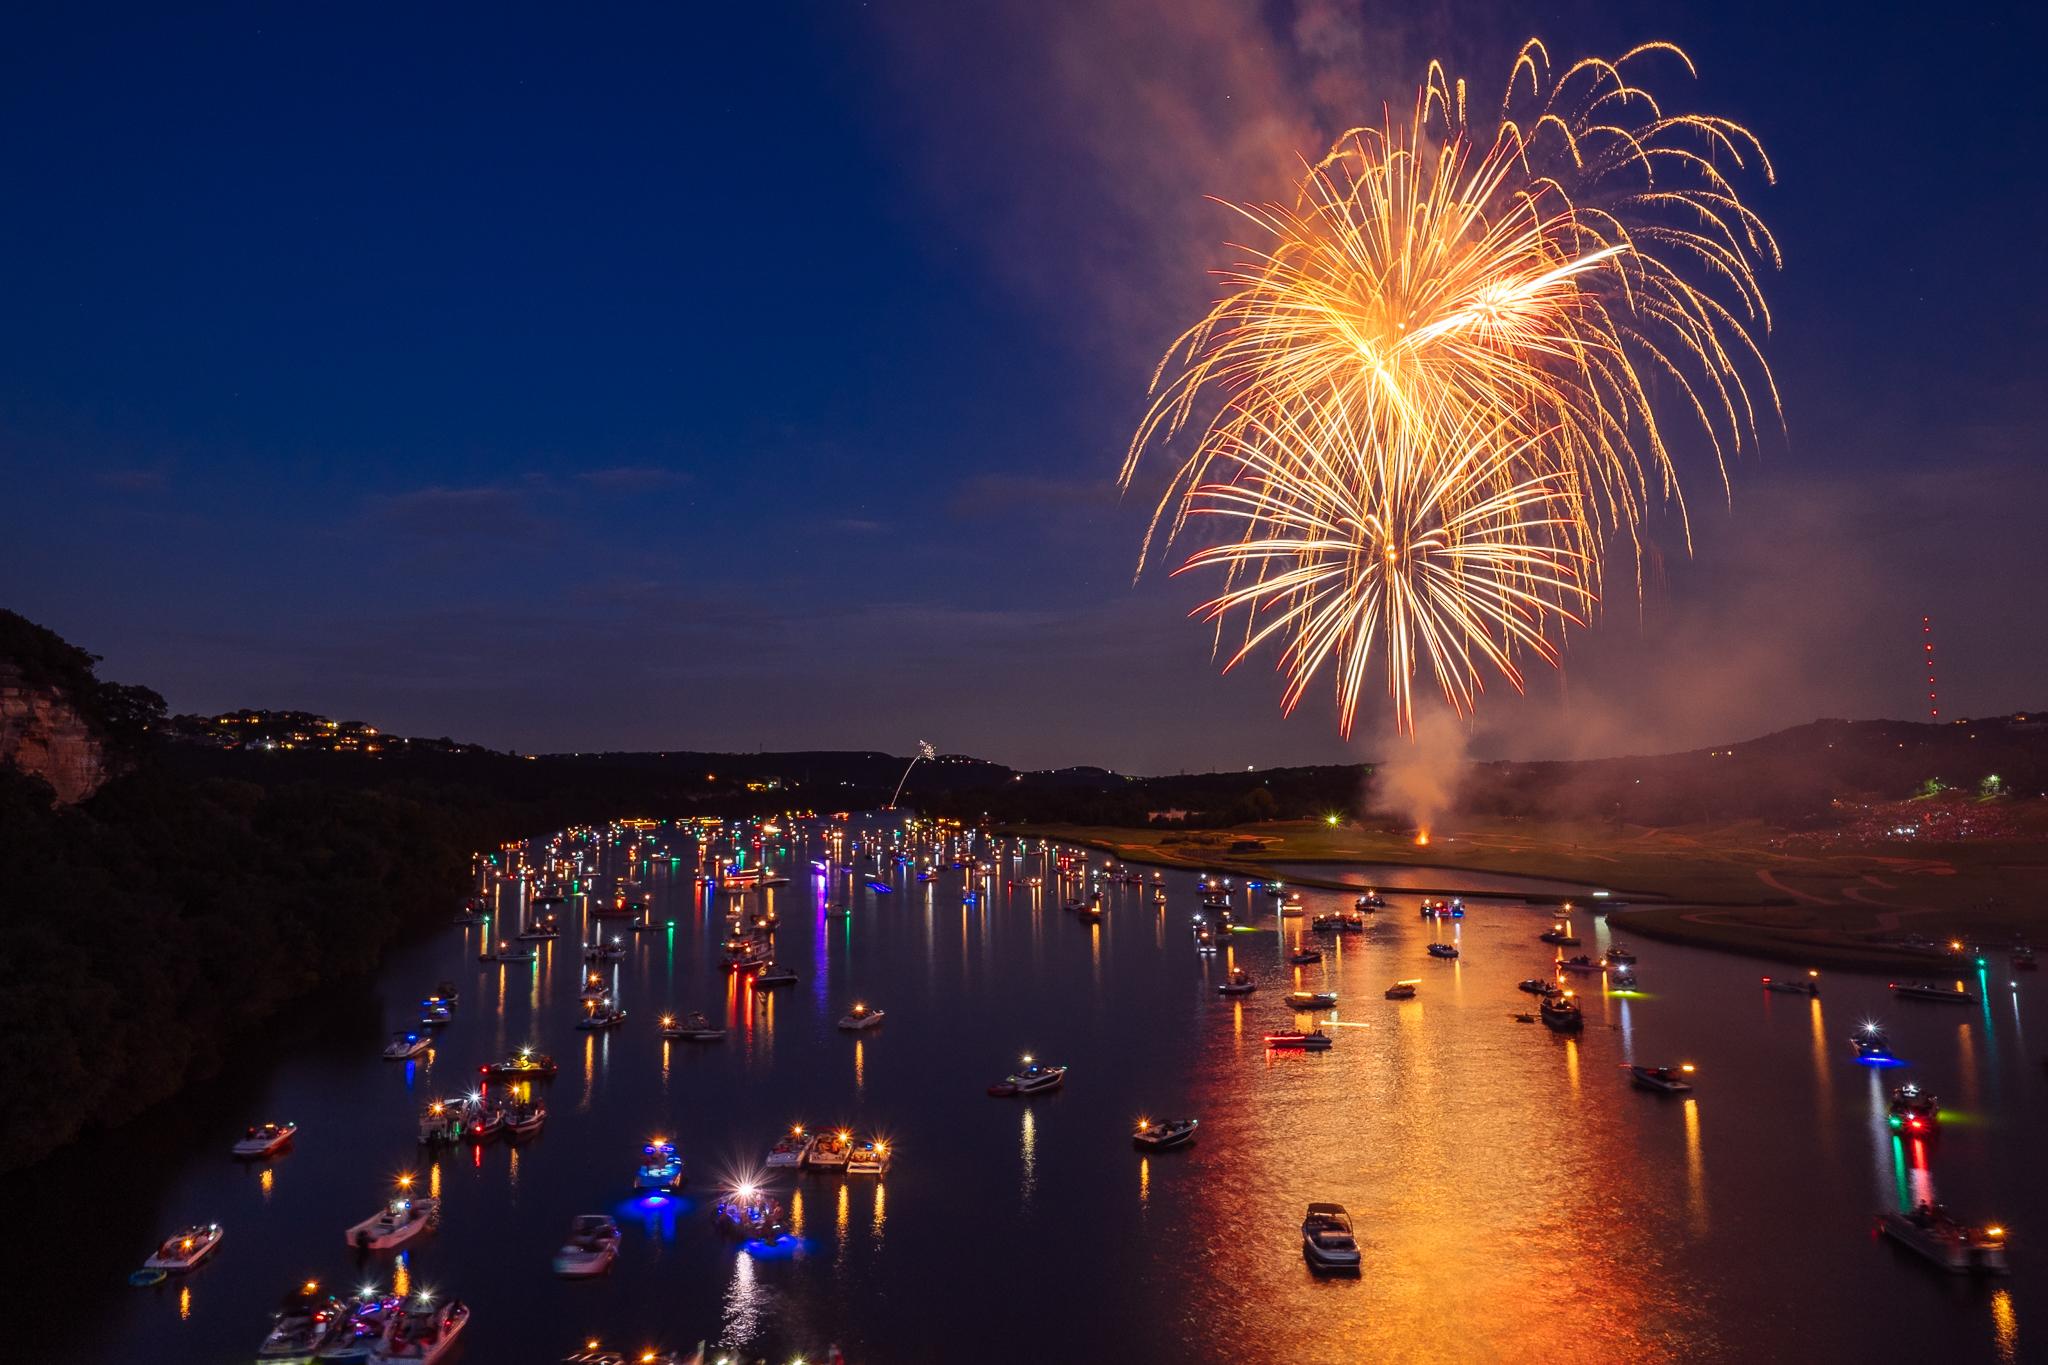 austin_fireworks_2014_7.jpg